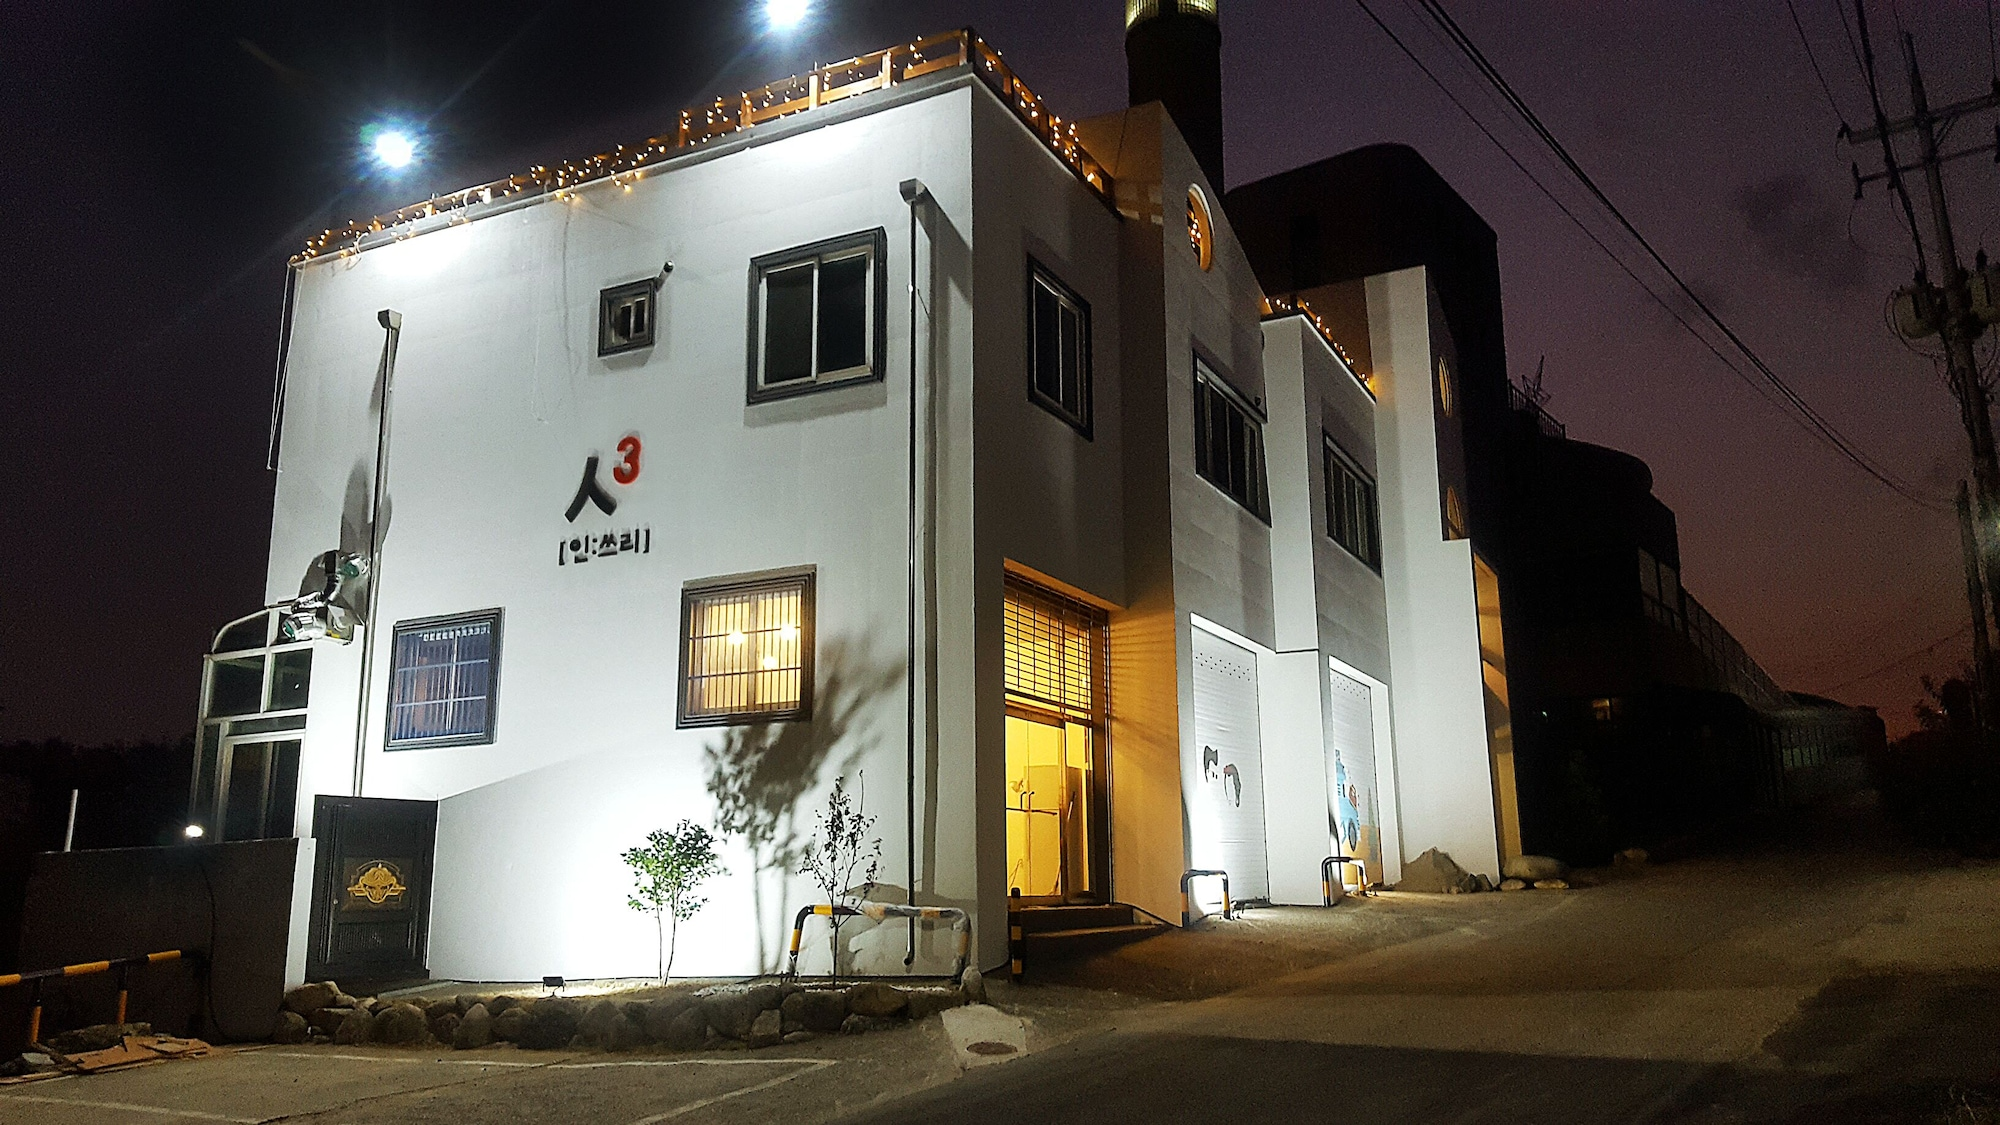 Inthree Gueshouse - Hostel, Donghae